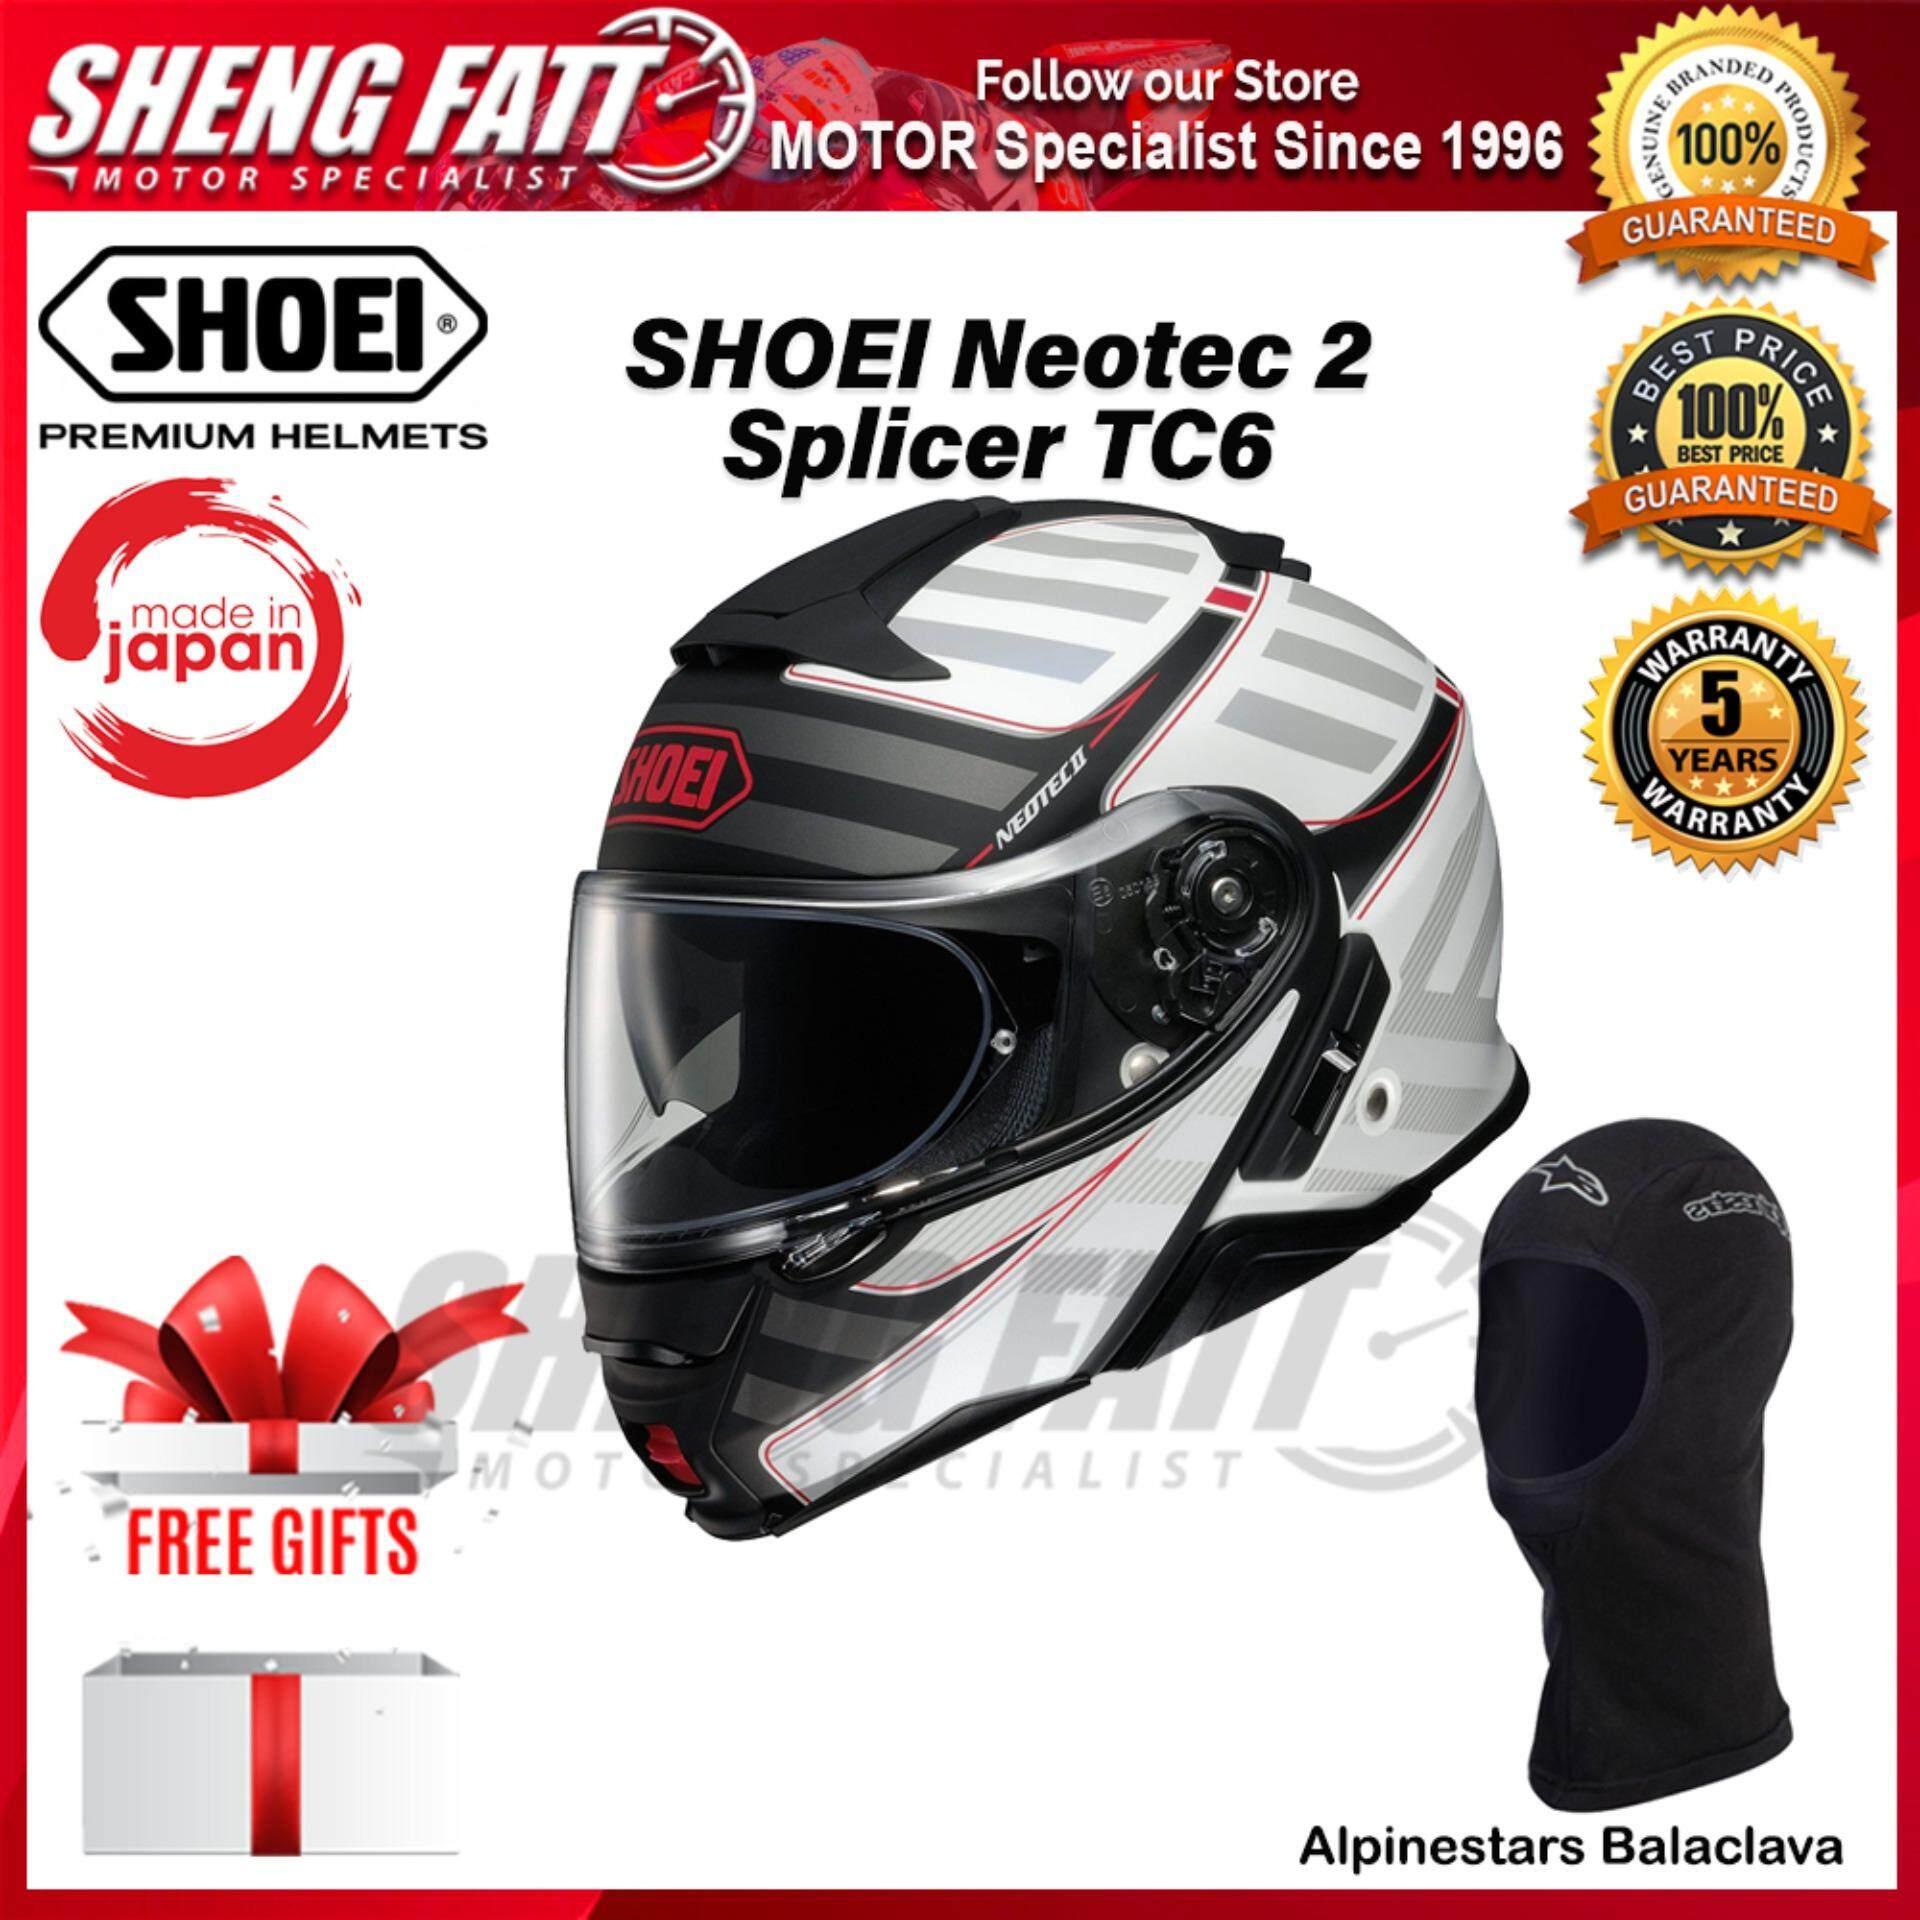 SHOEI Neotec 2 SPLICER TC6 FLIP FACE HELMET- [ORIGINAL]